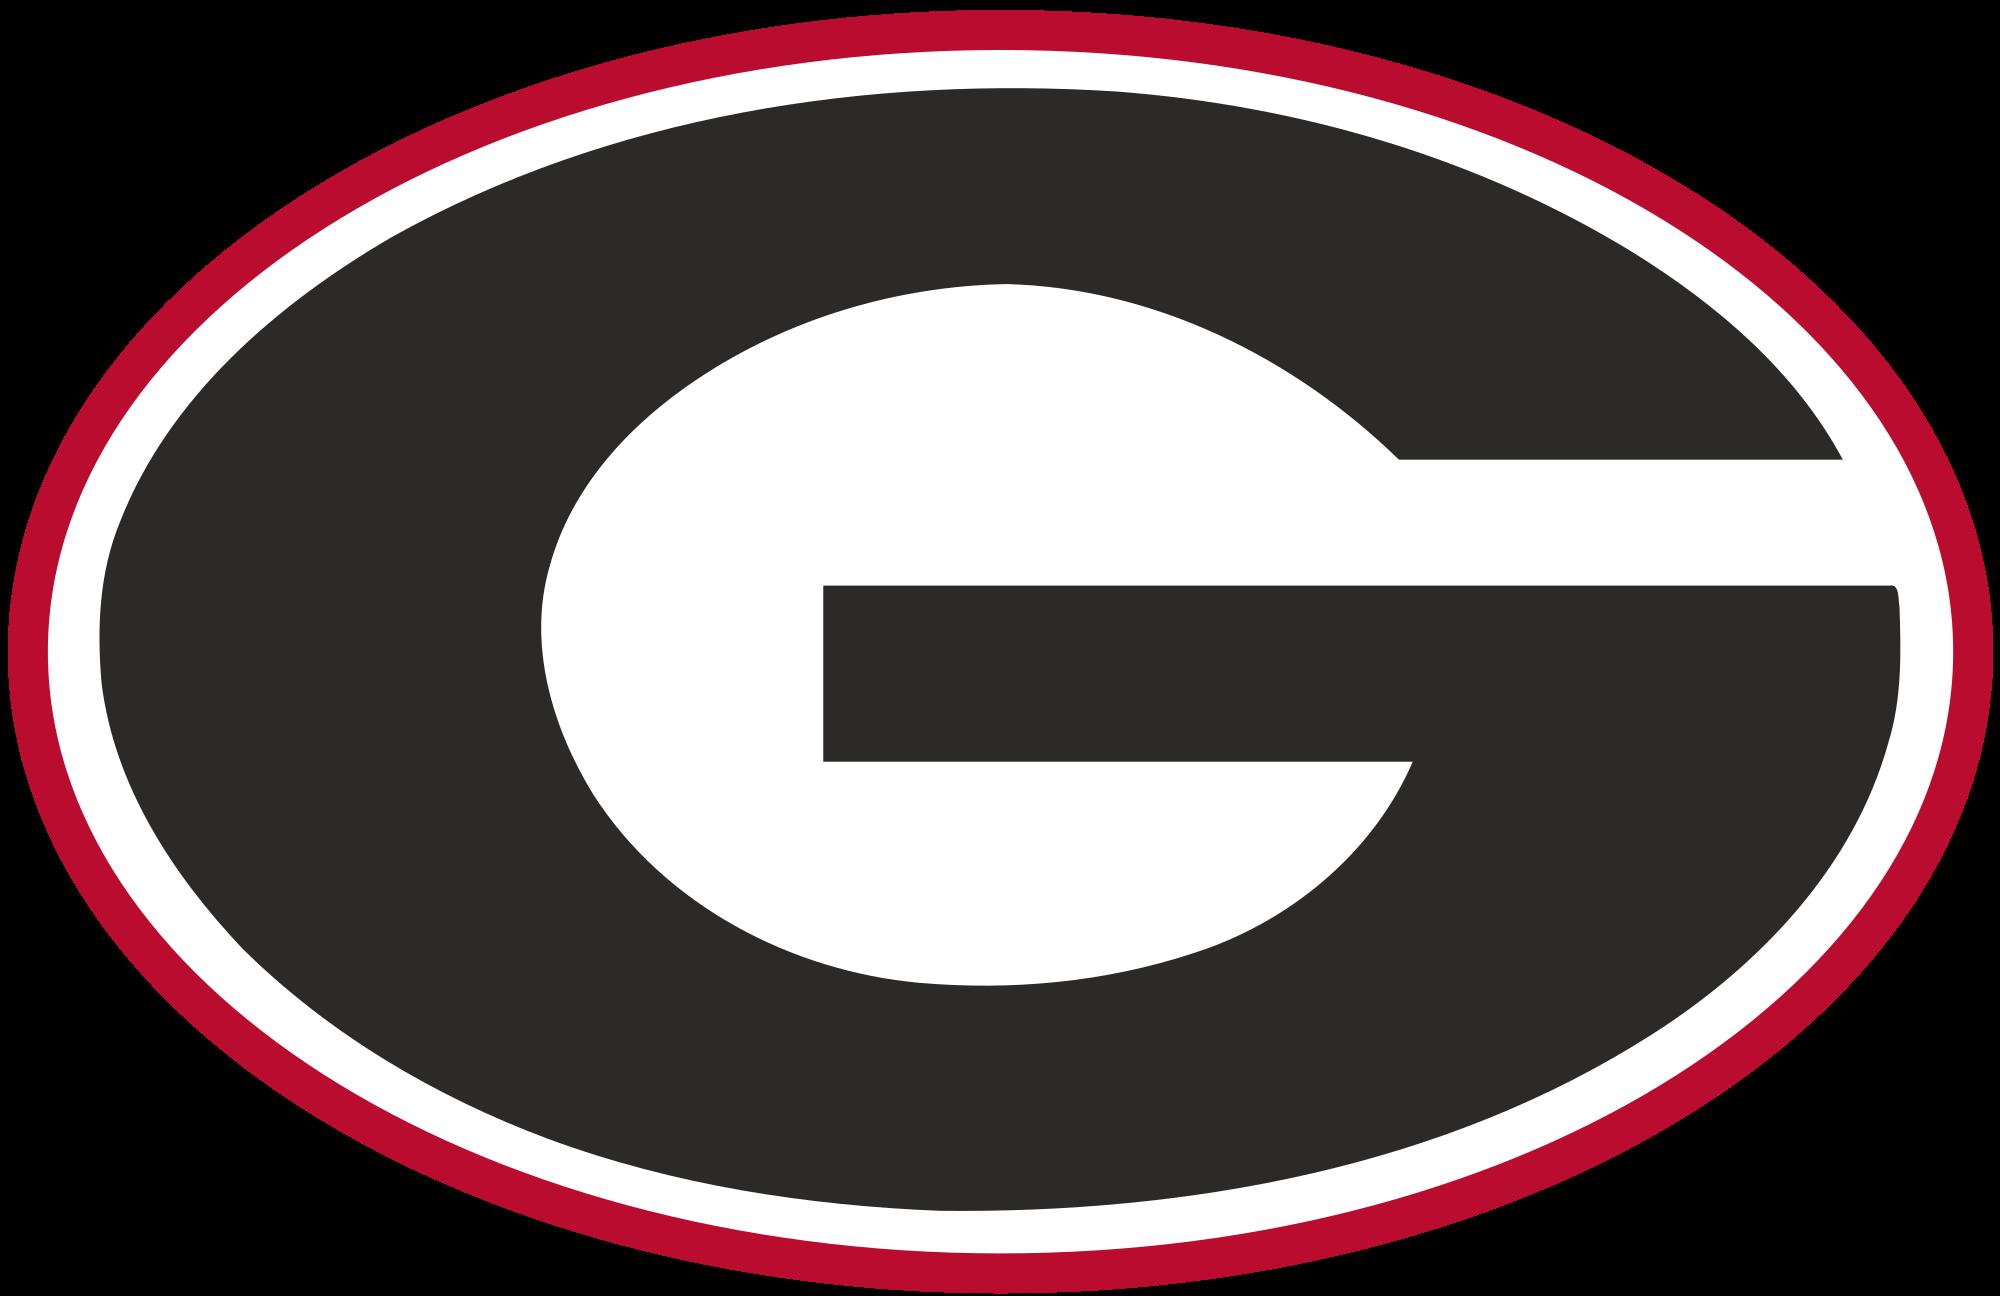 Georgia clipart template. File athletics logo svg